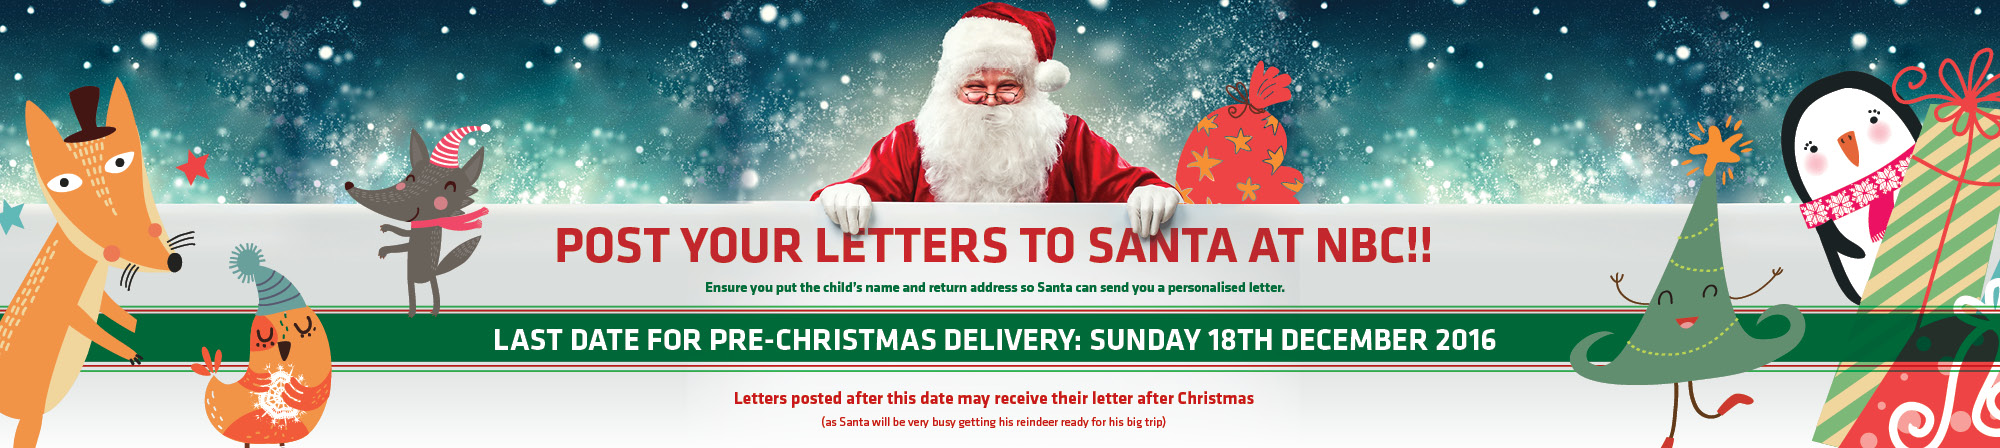 Letters-to-Santa-2016-Slide-2000x448